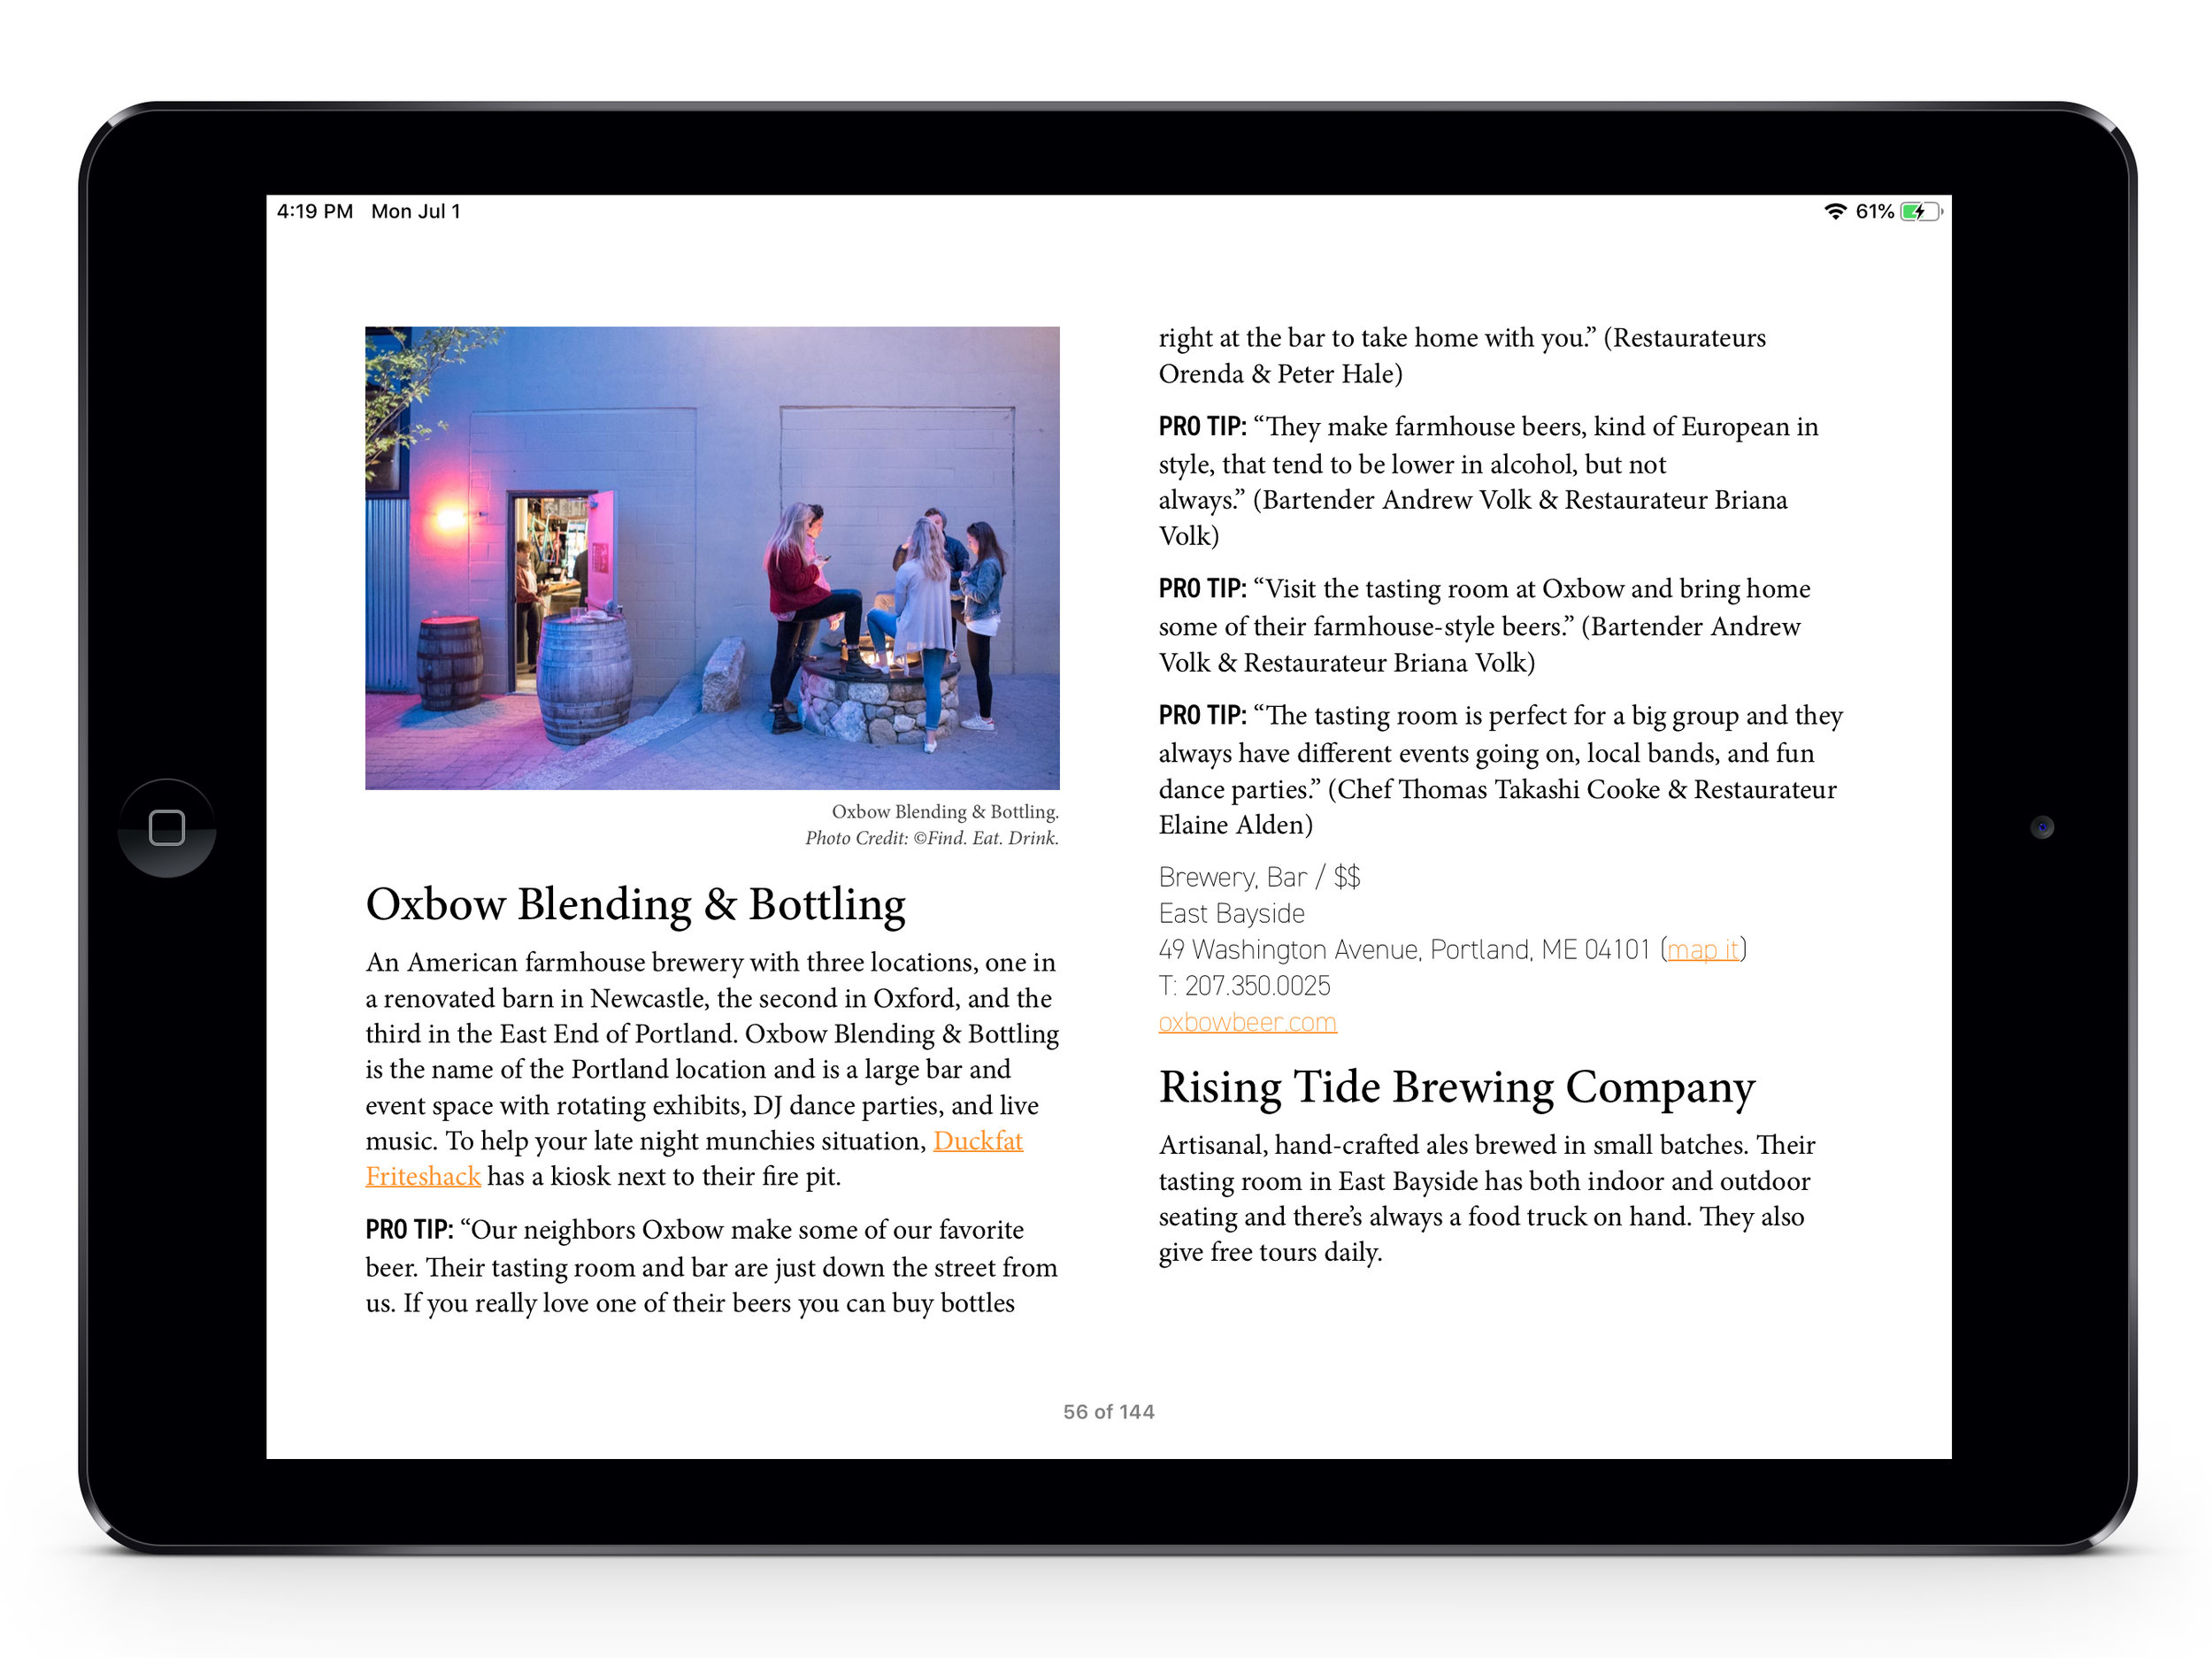 iPadAir_PortlandME_Screenshots_Landscape_1.11.jpg